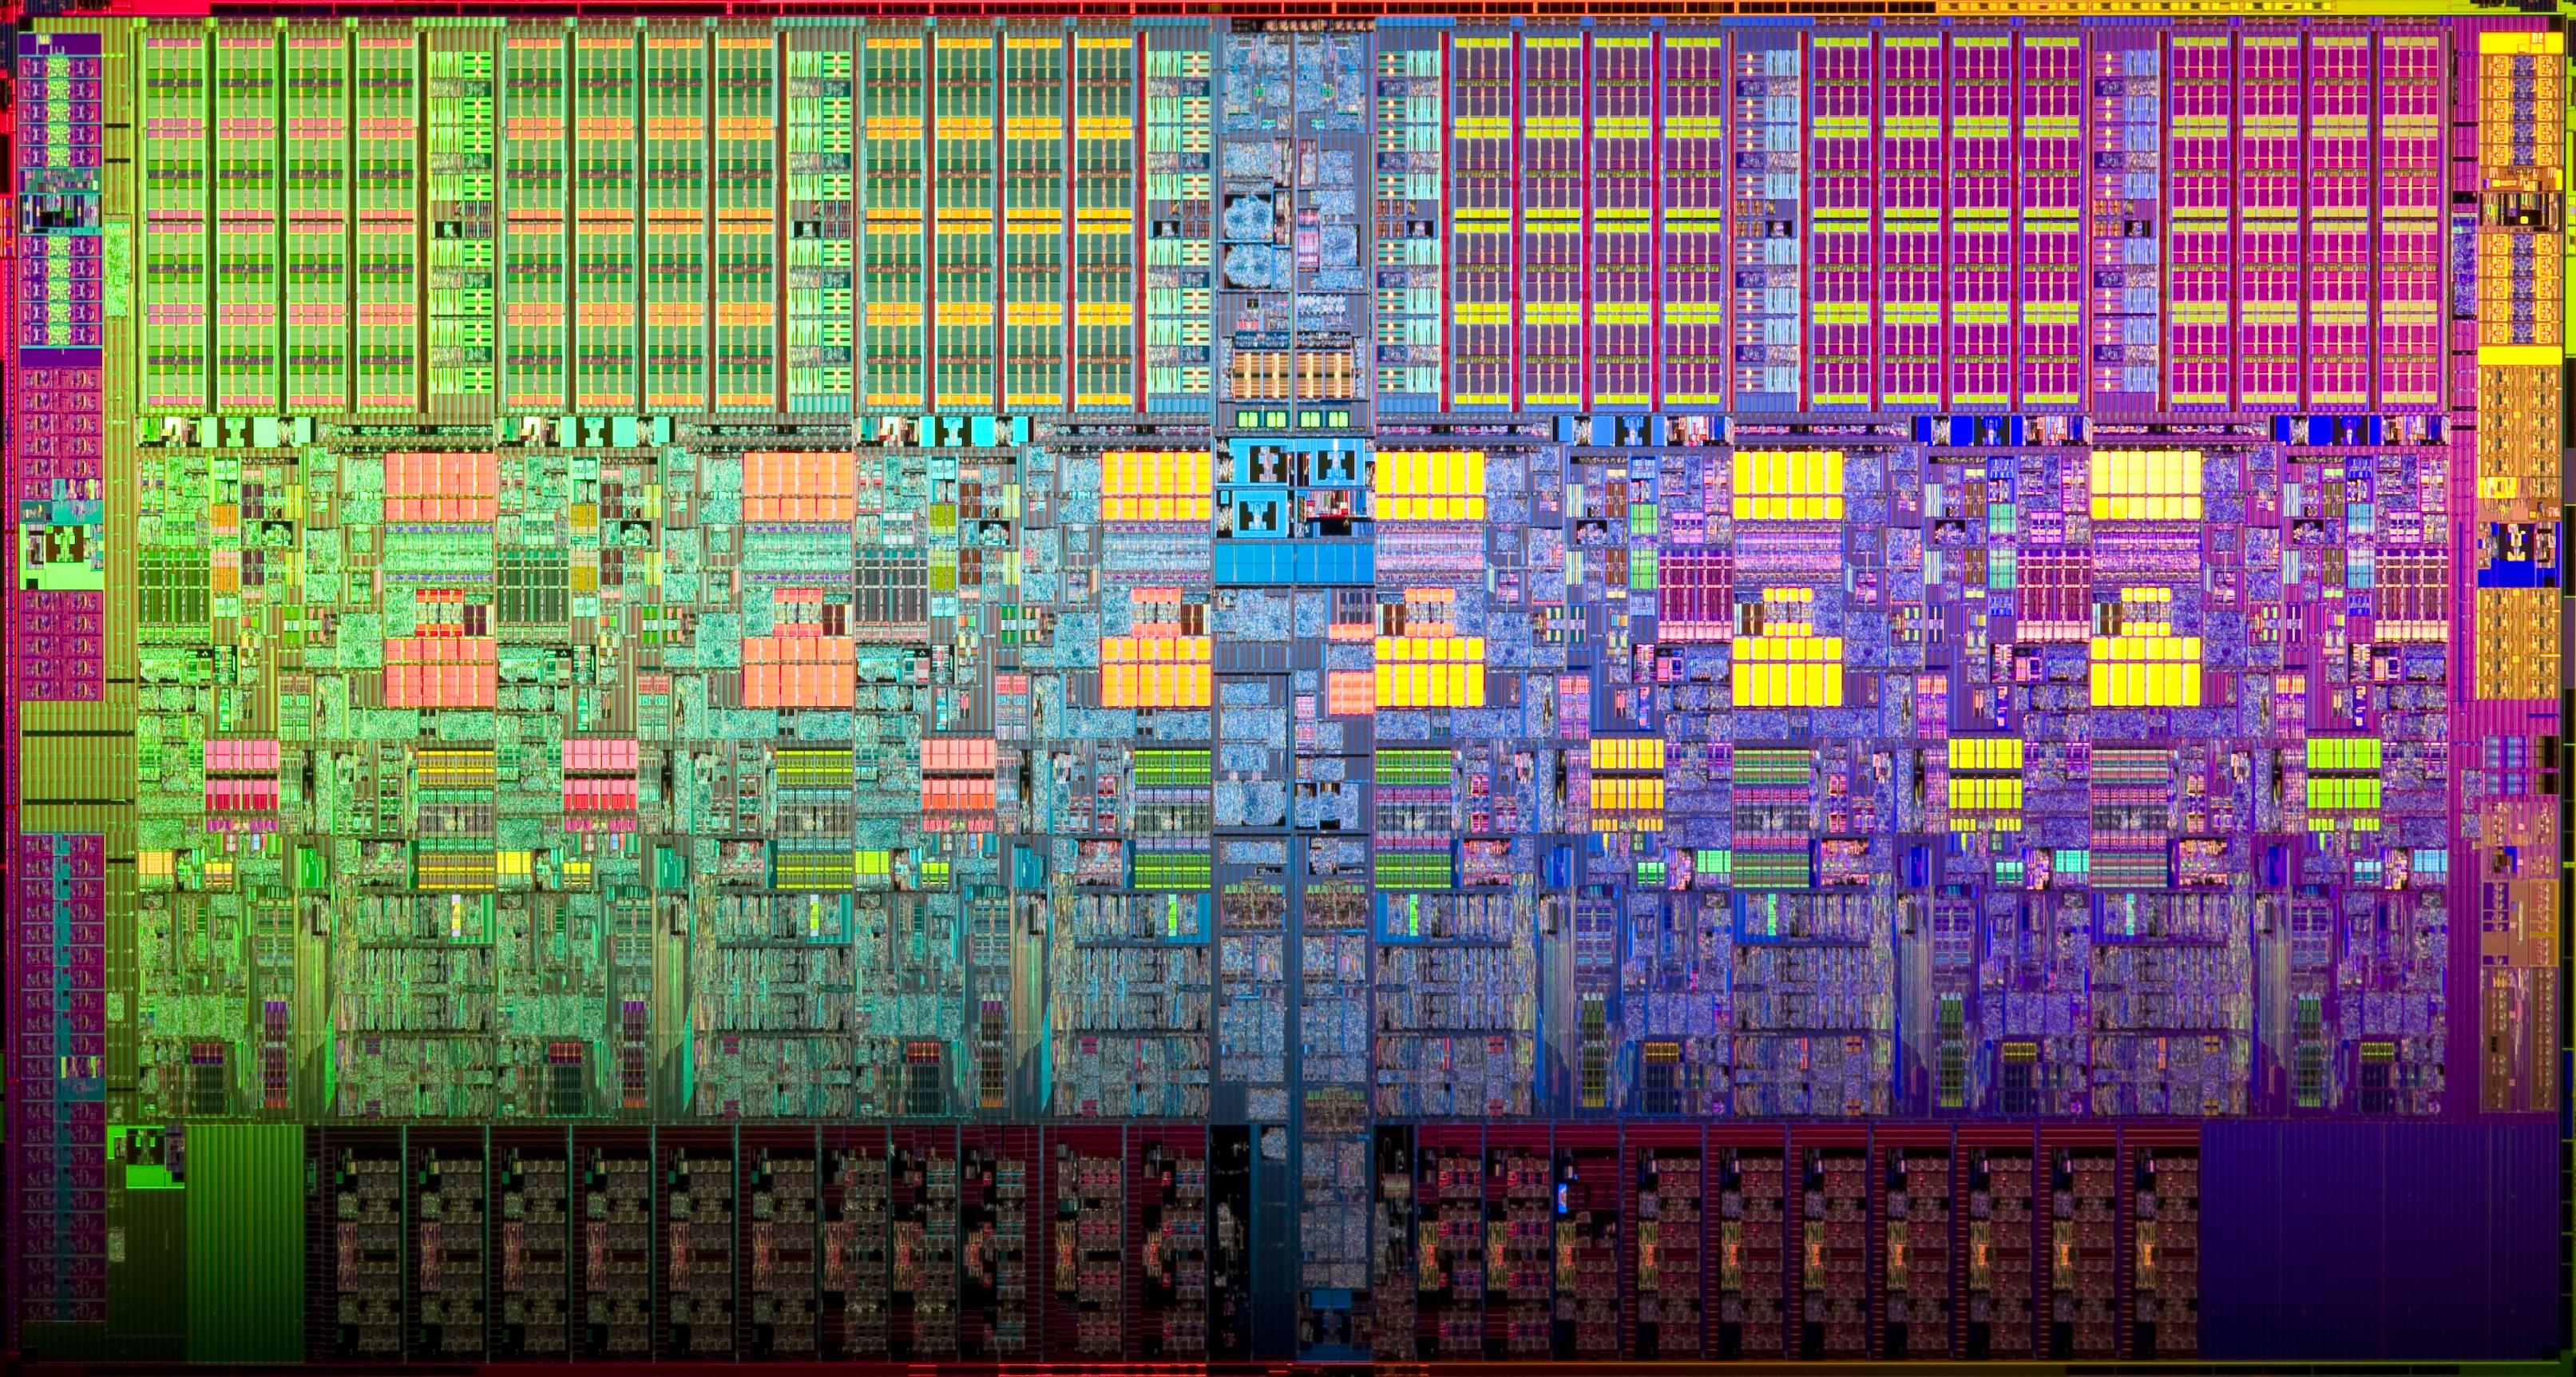 Die d'un CPU 6 cœurs